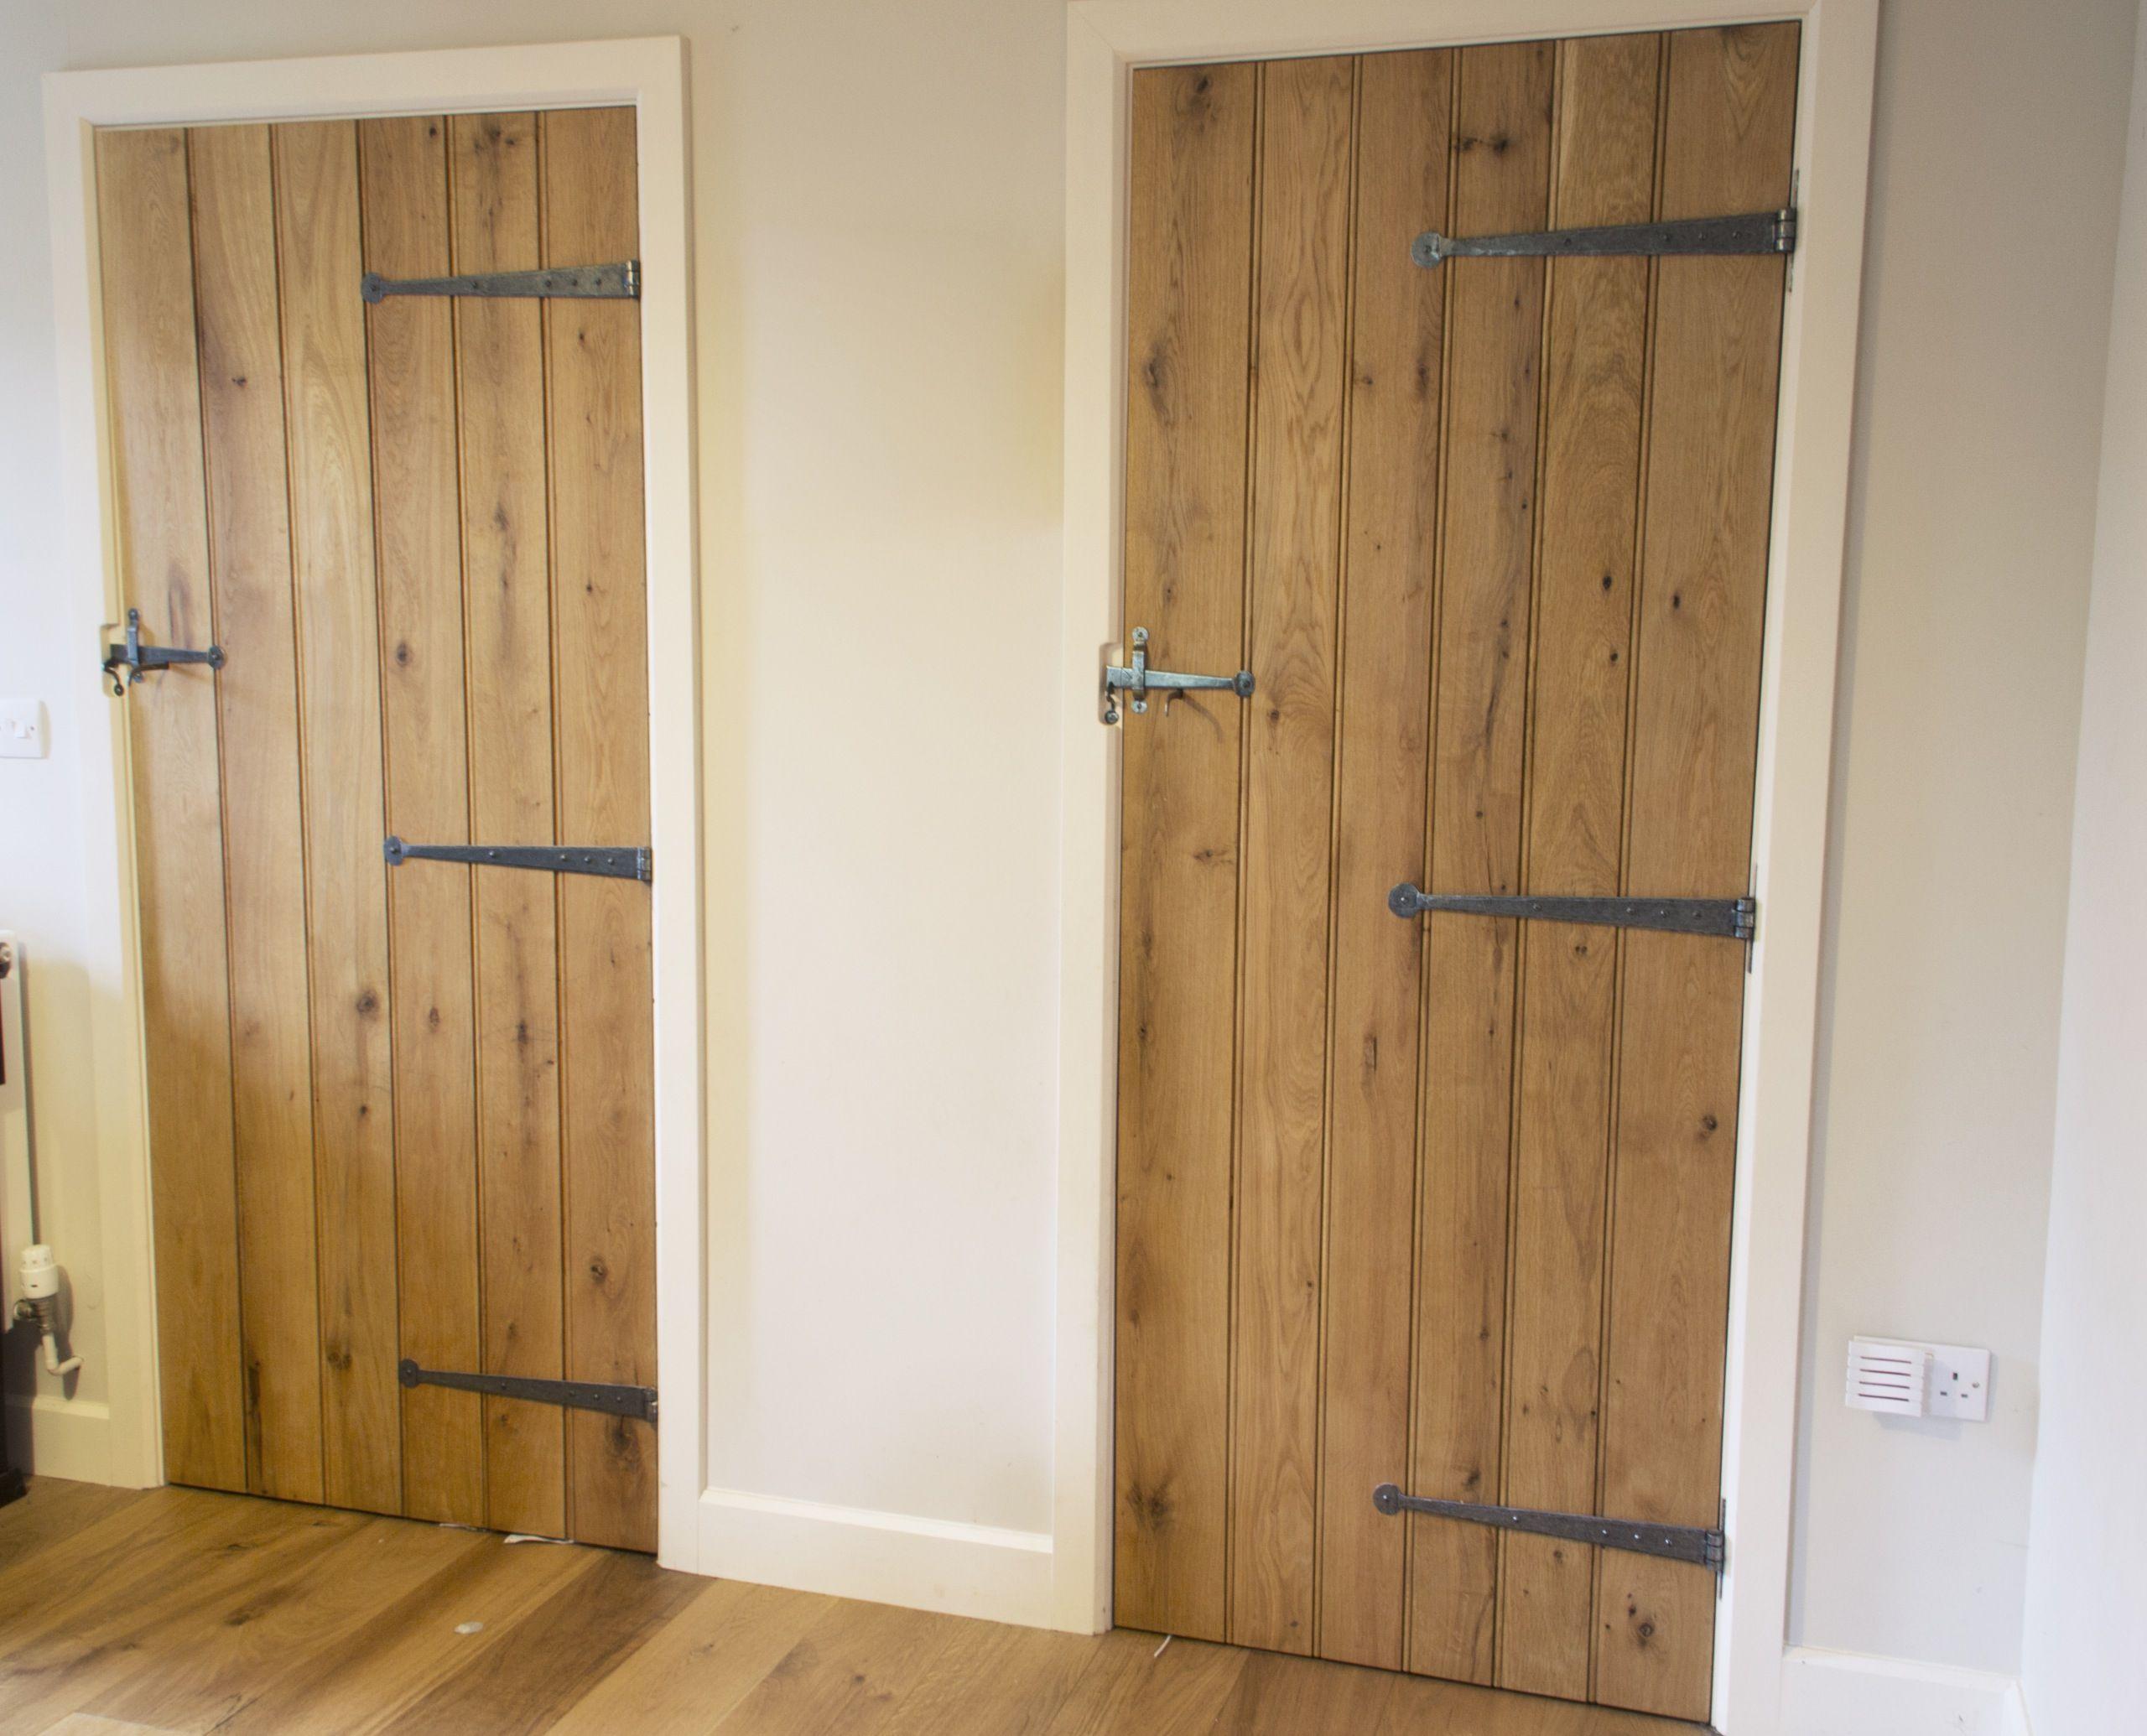 Penny Pewter T Hinges Traditional Doors Cupboard Door Hinges Cottage Style Doors